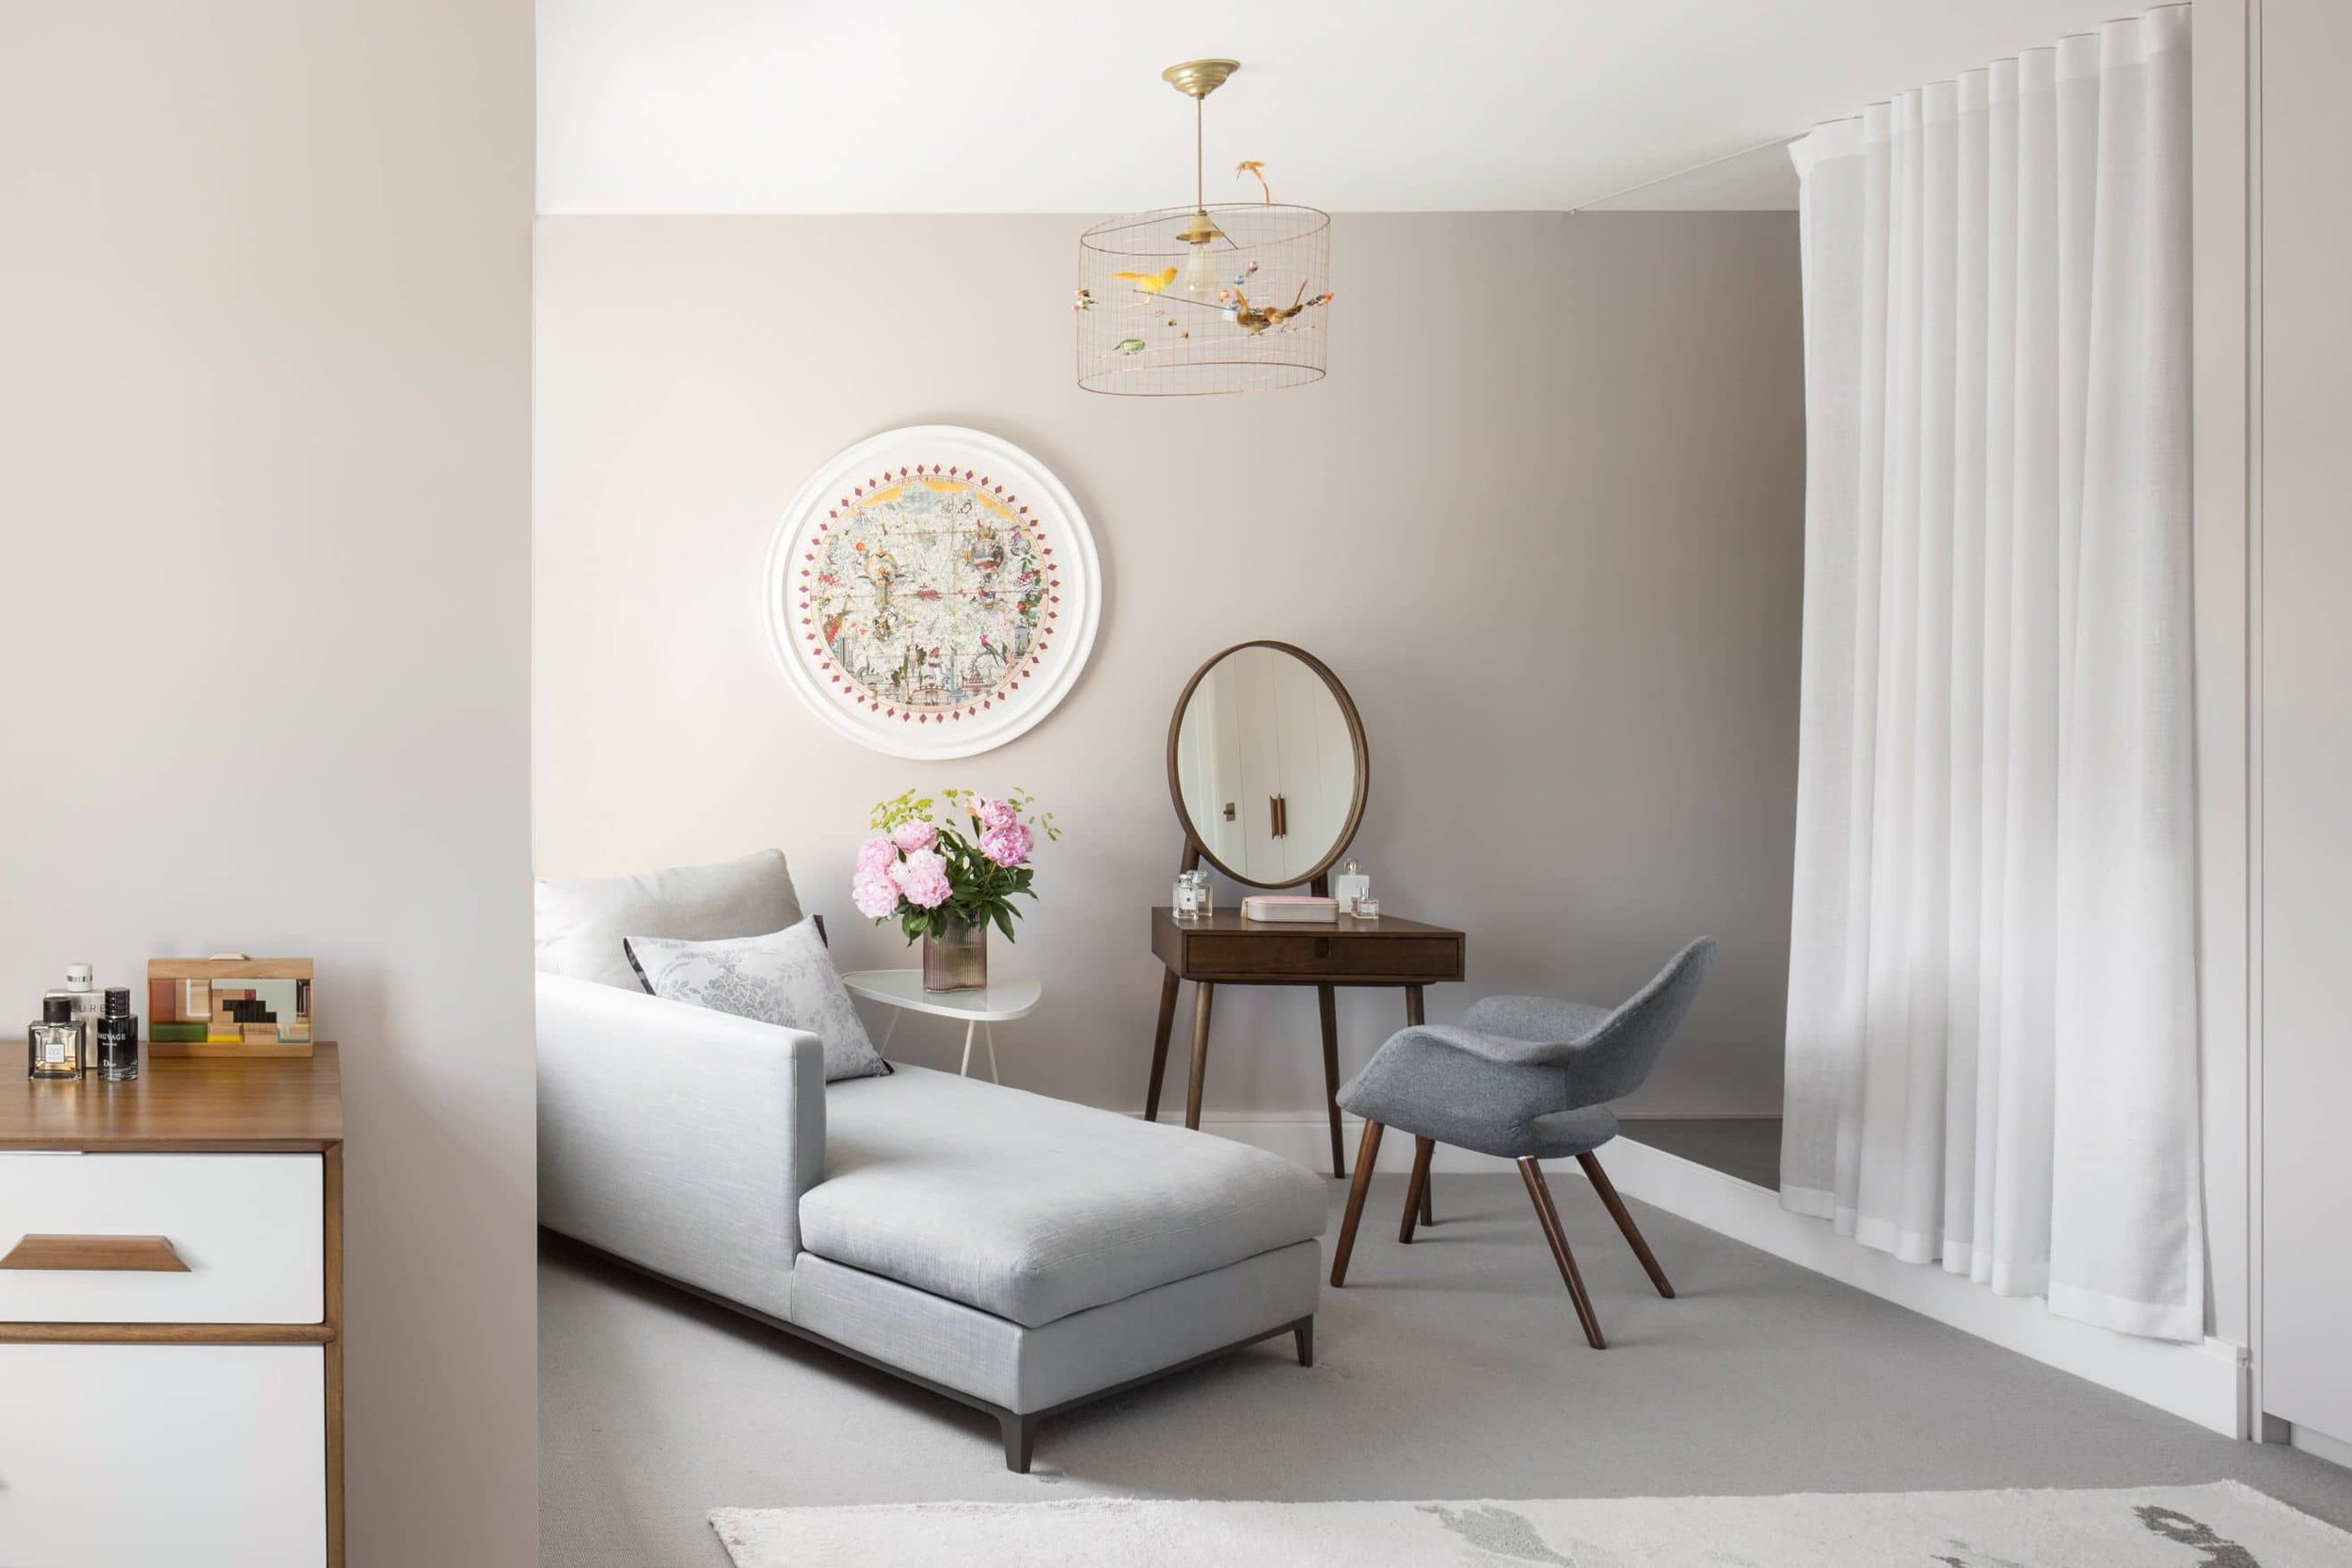 Fulham-Master-Bedroom-Suite-Refurbishment-London-8.jpg